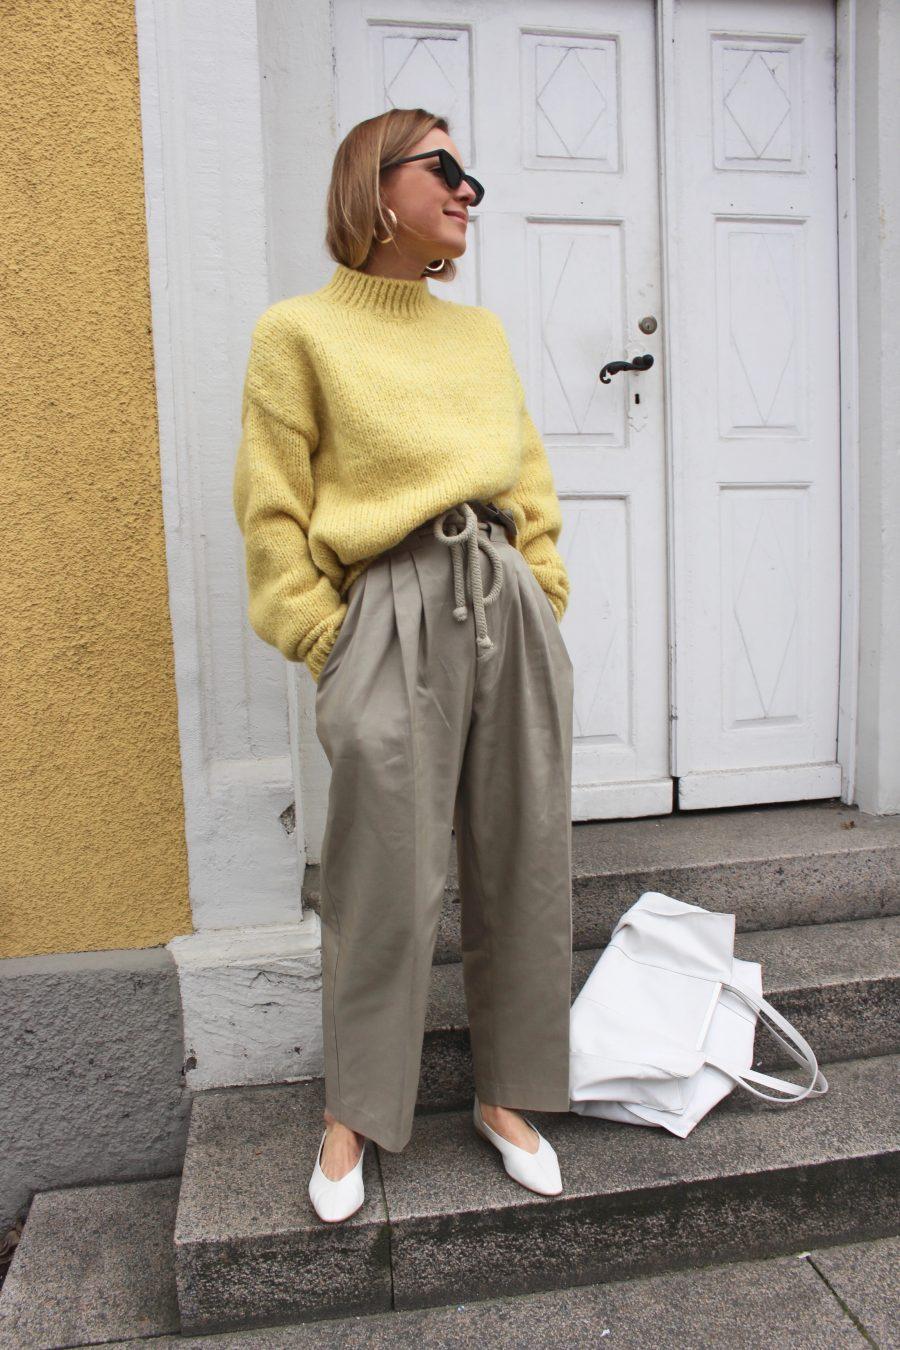 Khaki Pants summer 2018 H&M Trend